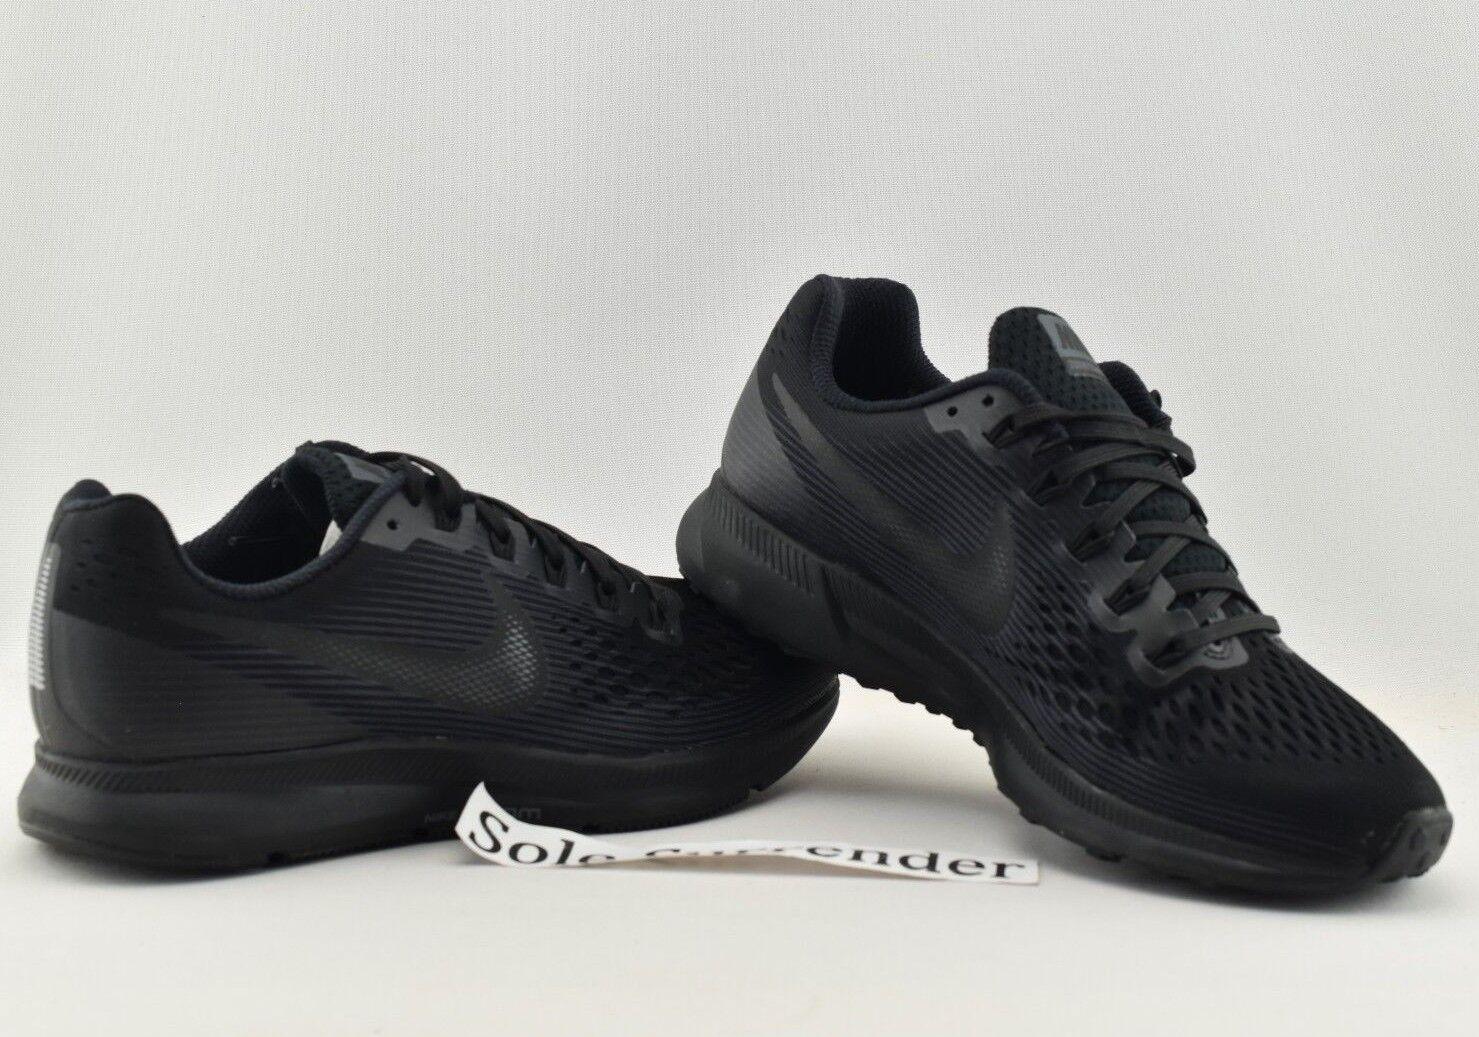 Nike air zoom pegasus 34 - misura nero 6,5 - 880555-003 triple nero misura out in grigio 301115